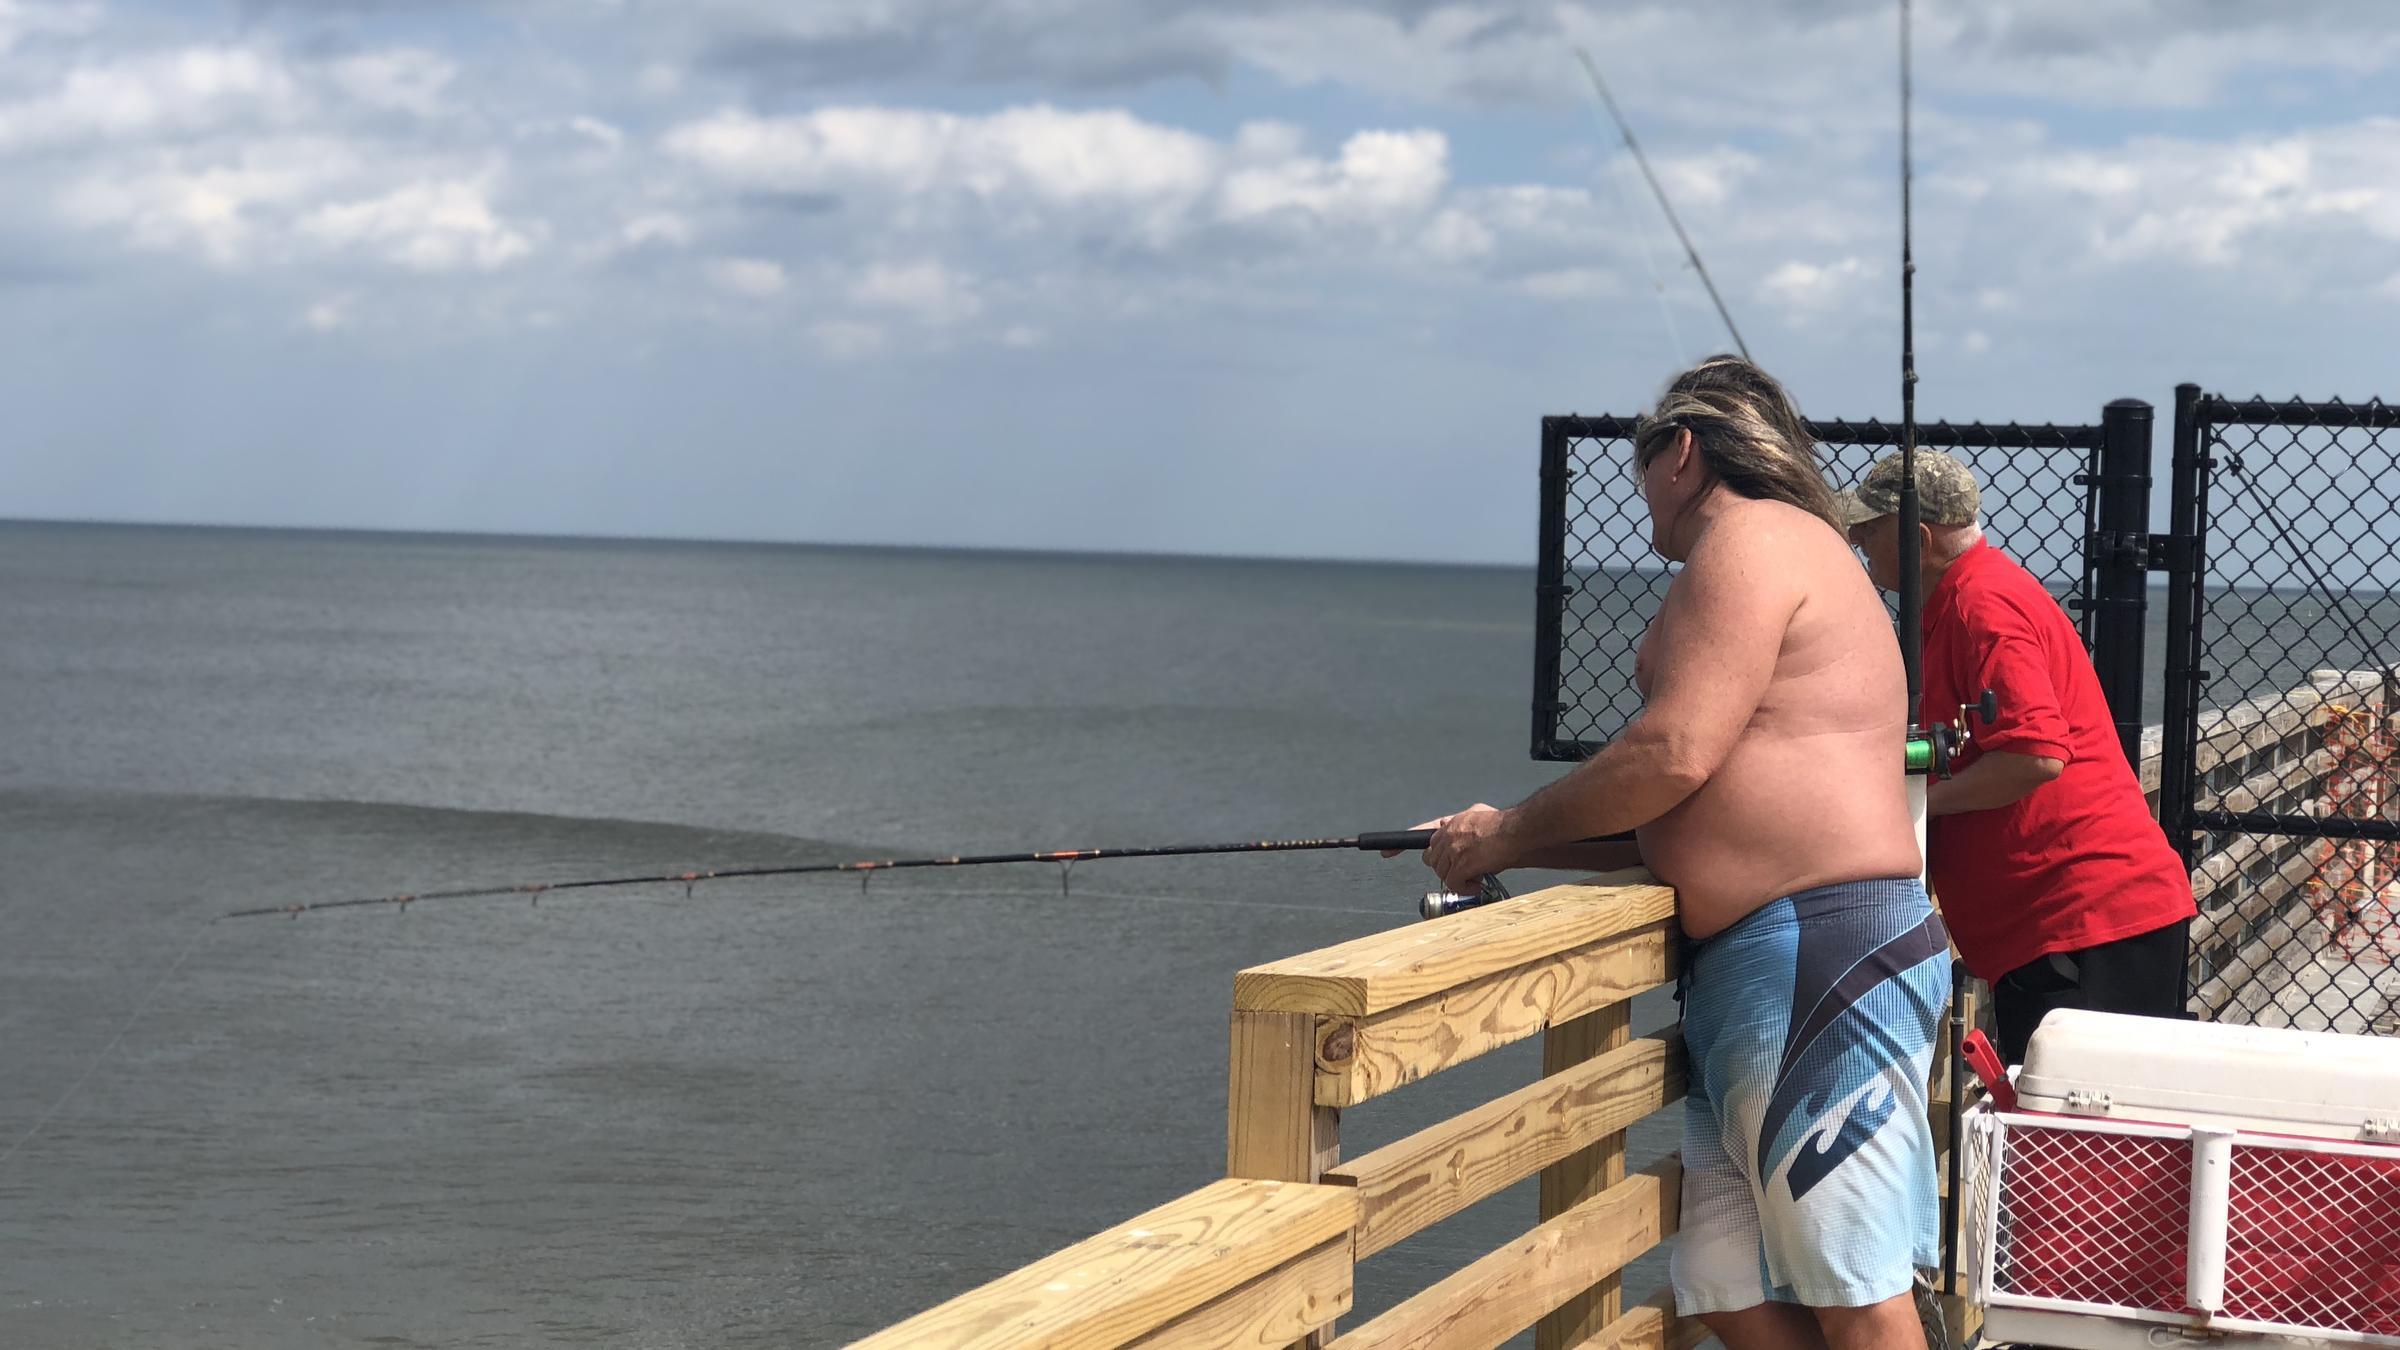 Anglers rejoice as jacksonville beach pier reopens wjct news for Harrison fishing pier